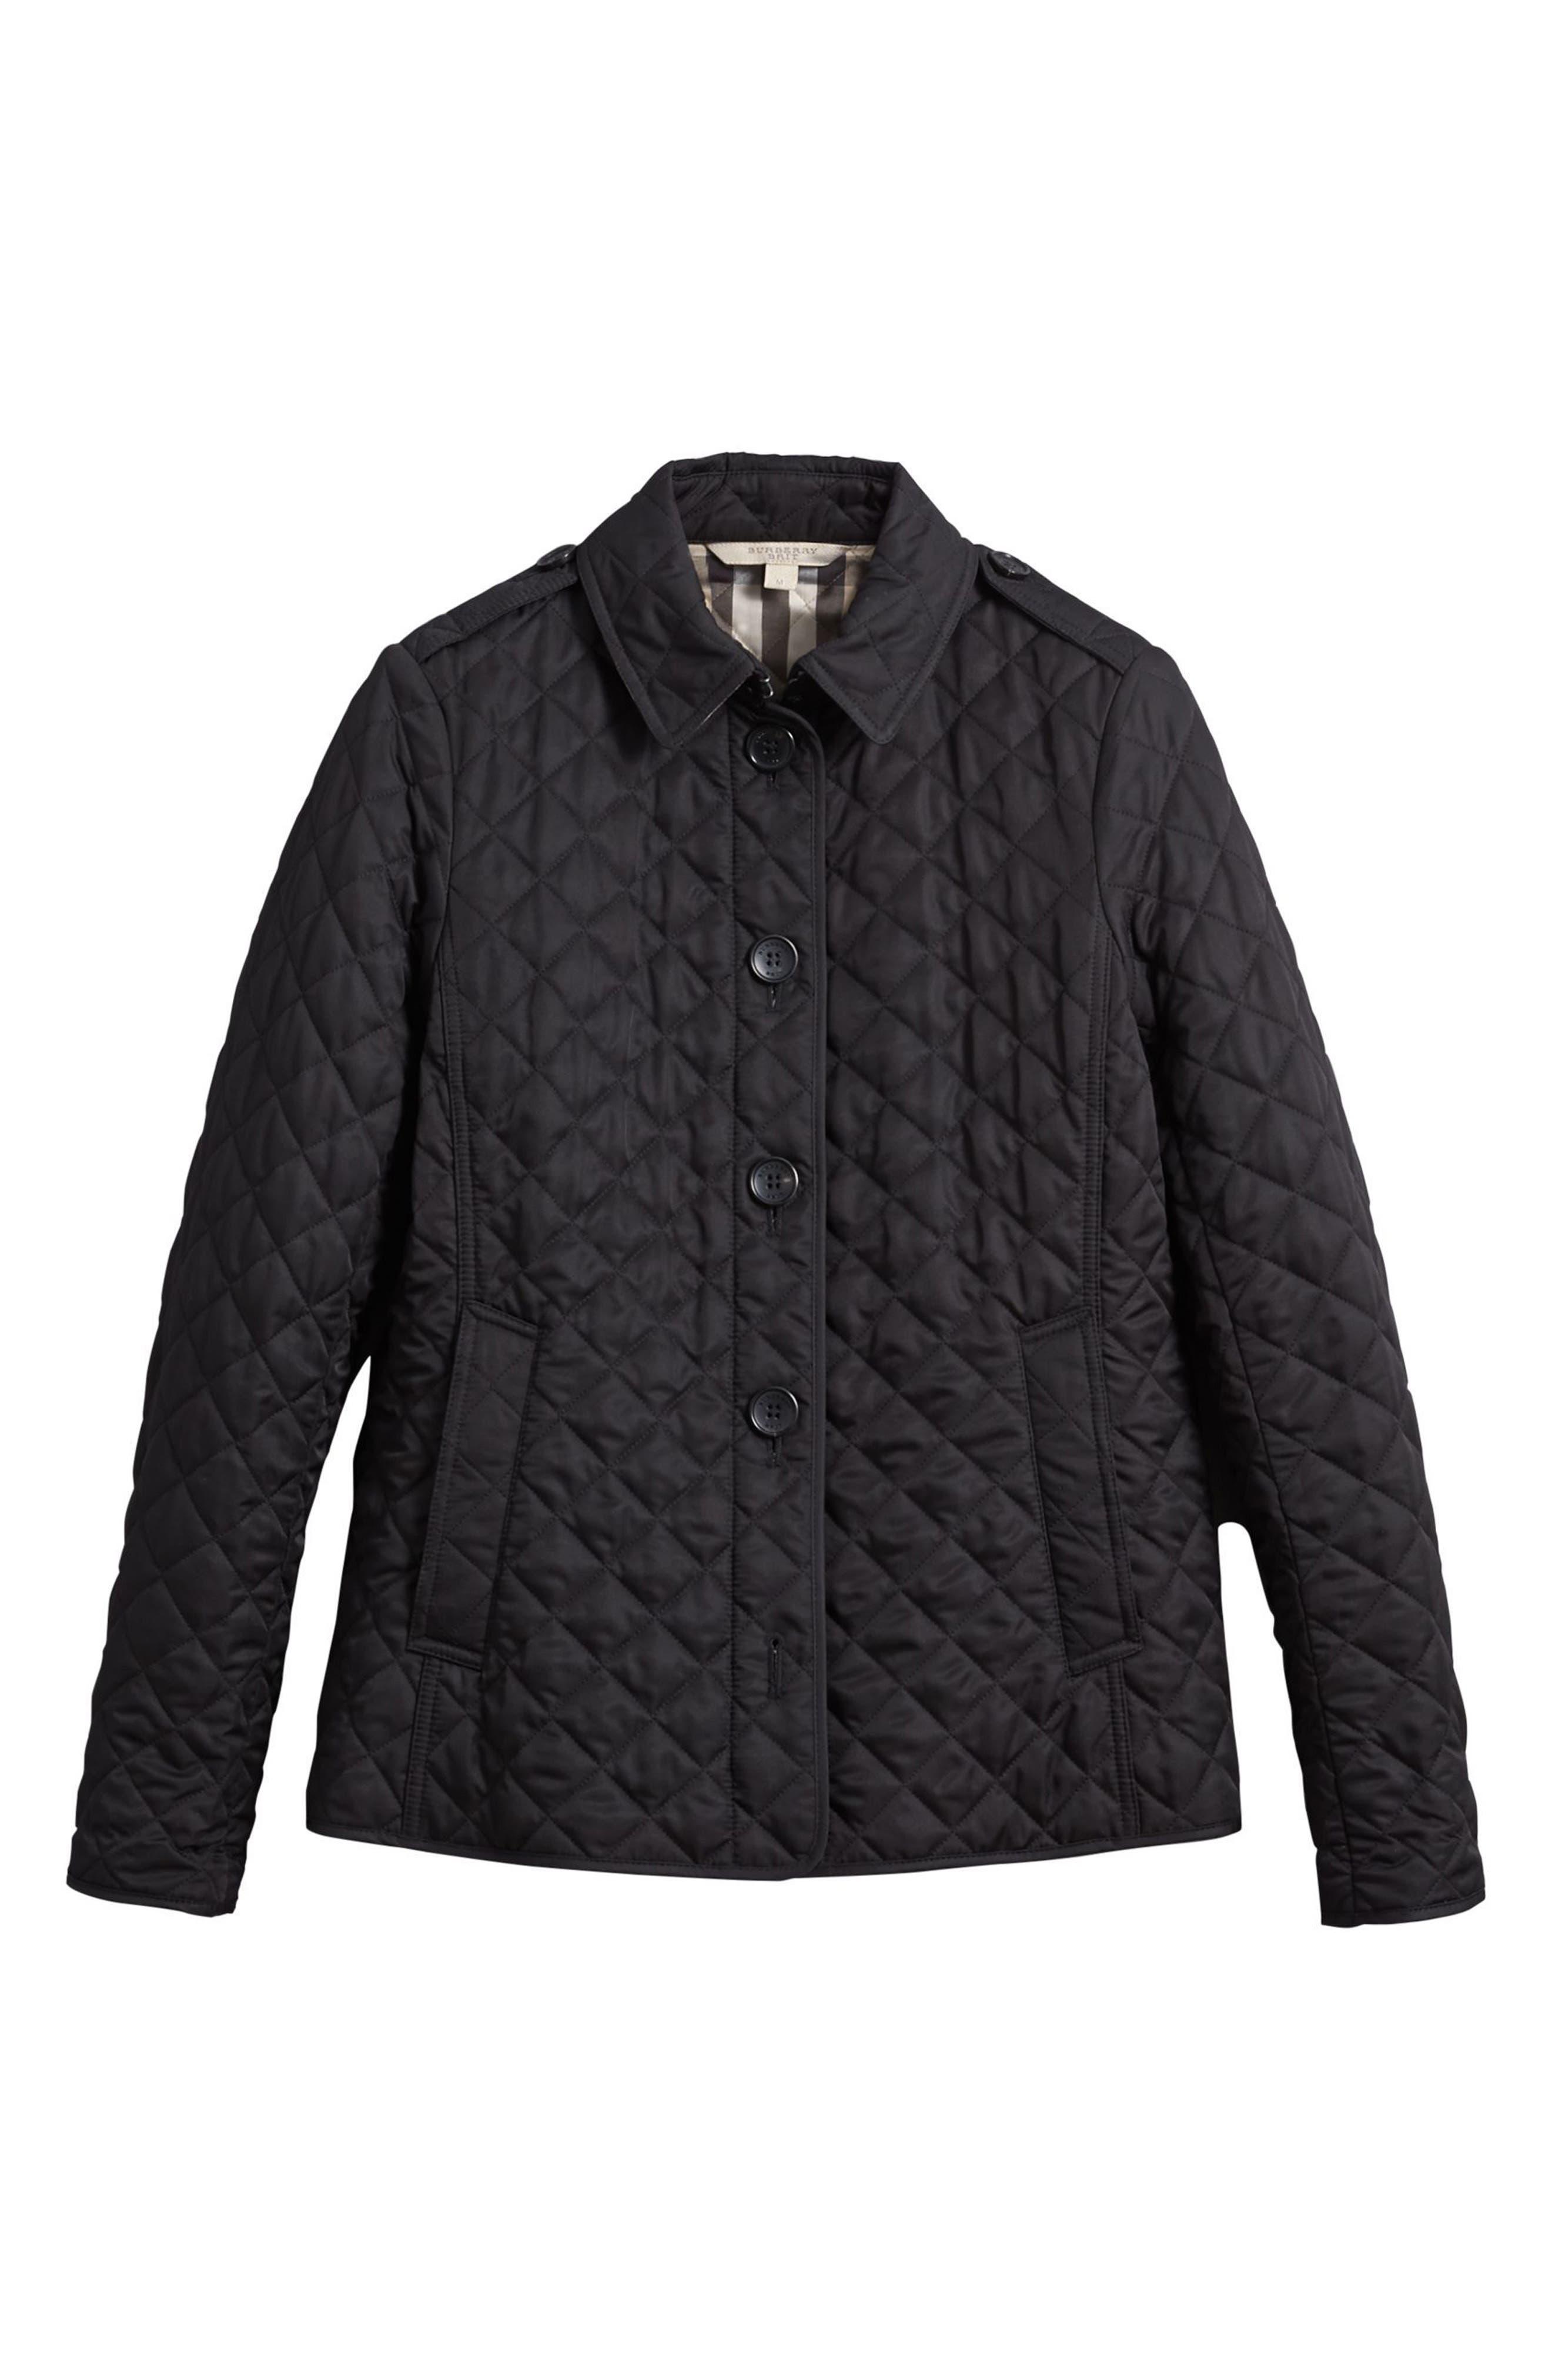 Ashurst Quilted Jacket,                             Alternate thumbnail 5, color,                             BLACK